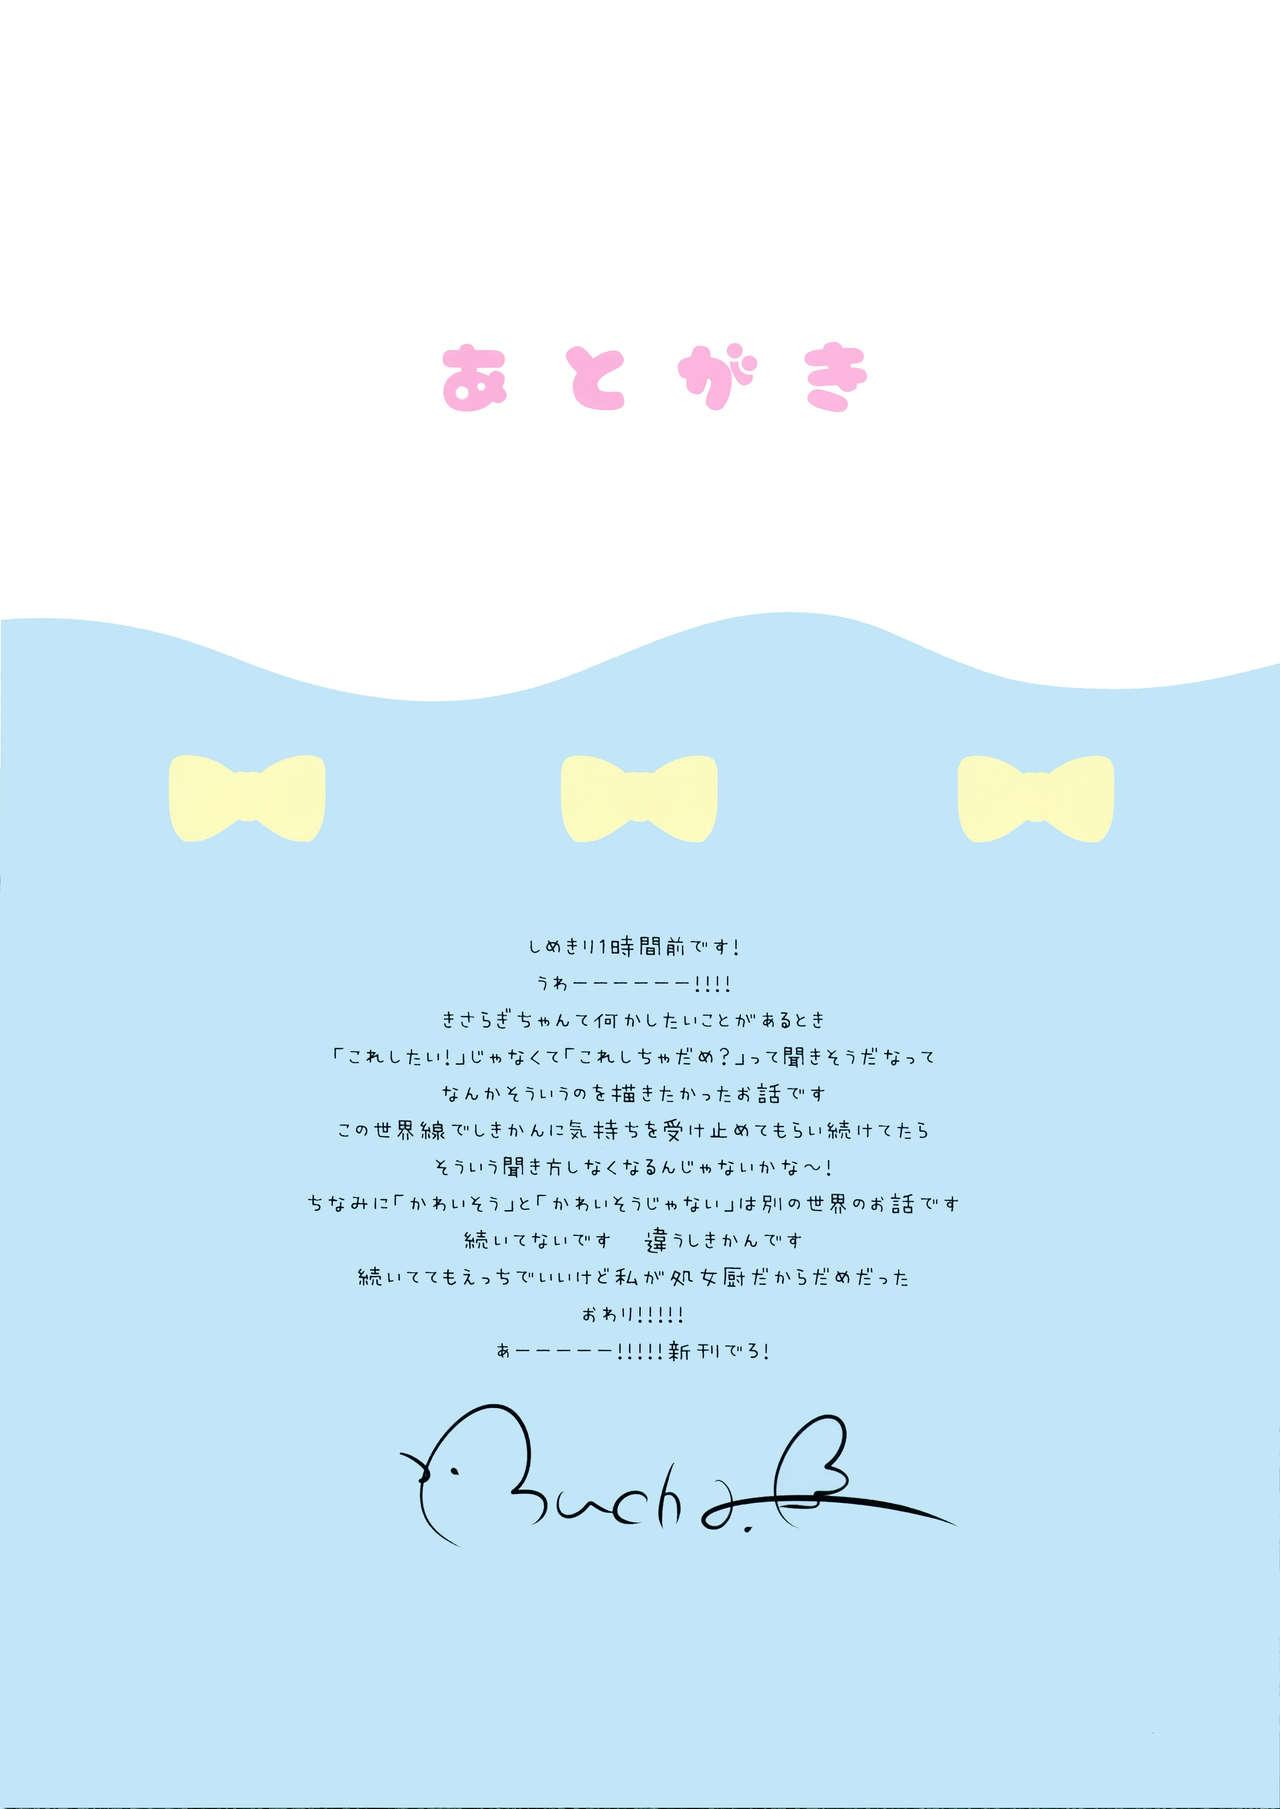 (COMIC1☆15) [PiyoPit (Piyodera Mucha)] Kisaragi-chan wa Kawaisou ja Nai!2 - Kisaragi-chan is not pitiful!2 (Azur Lane) [English] 10